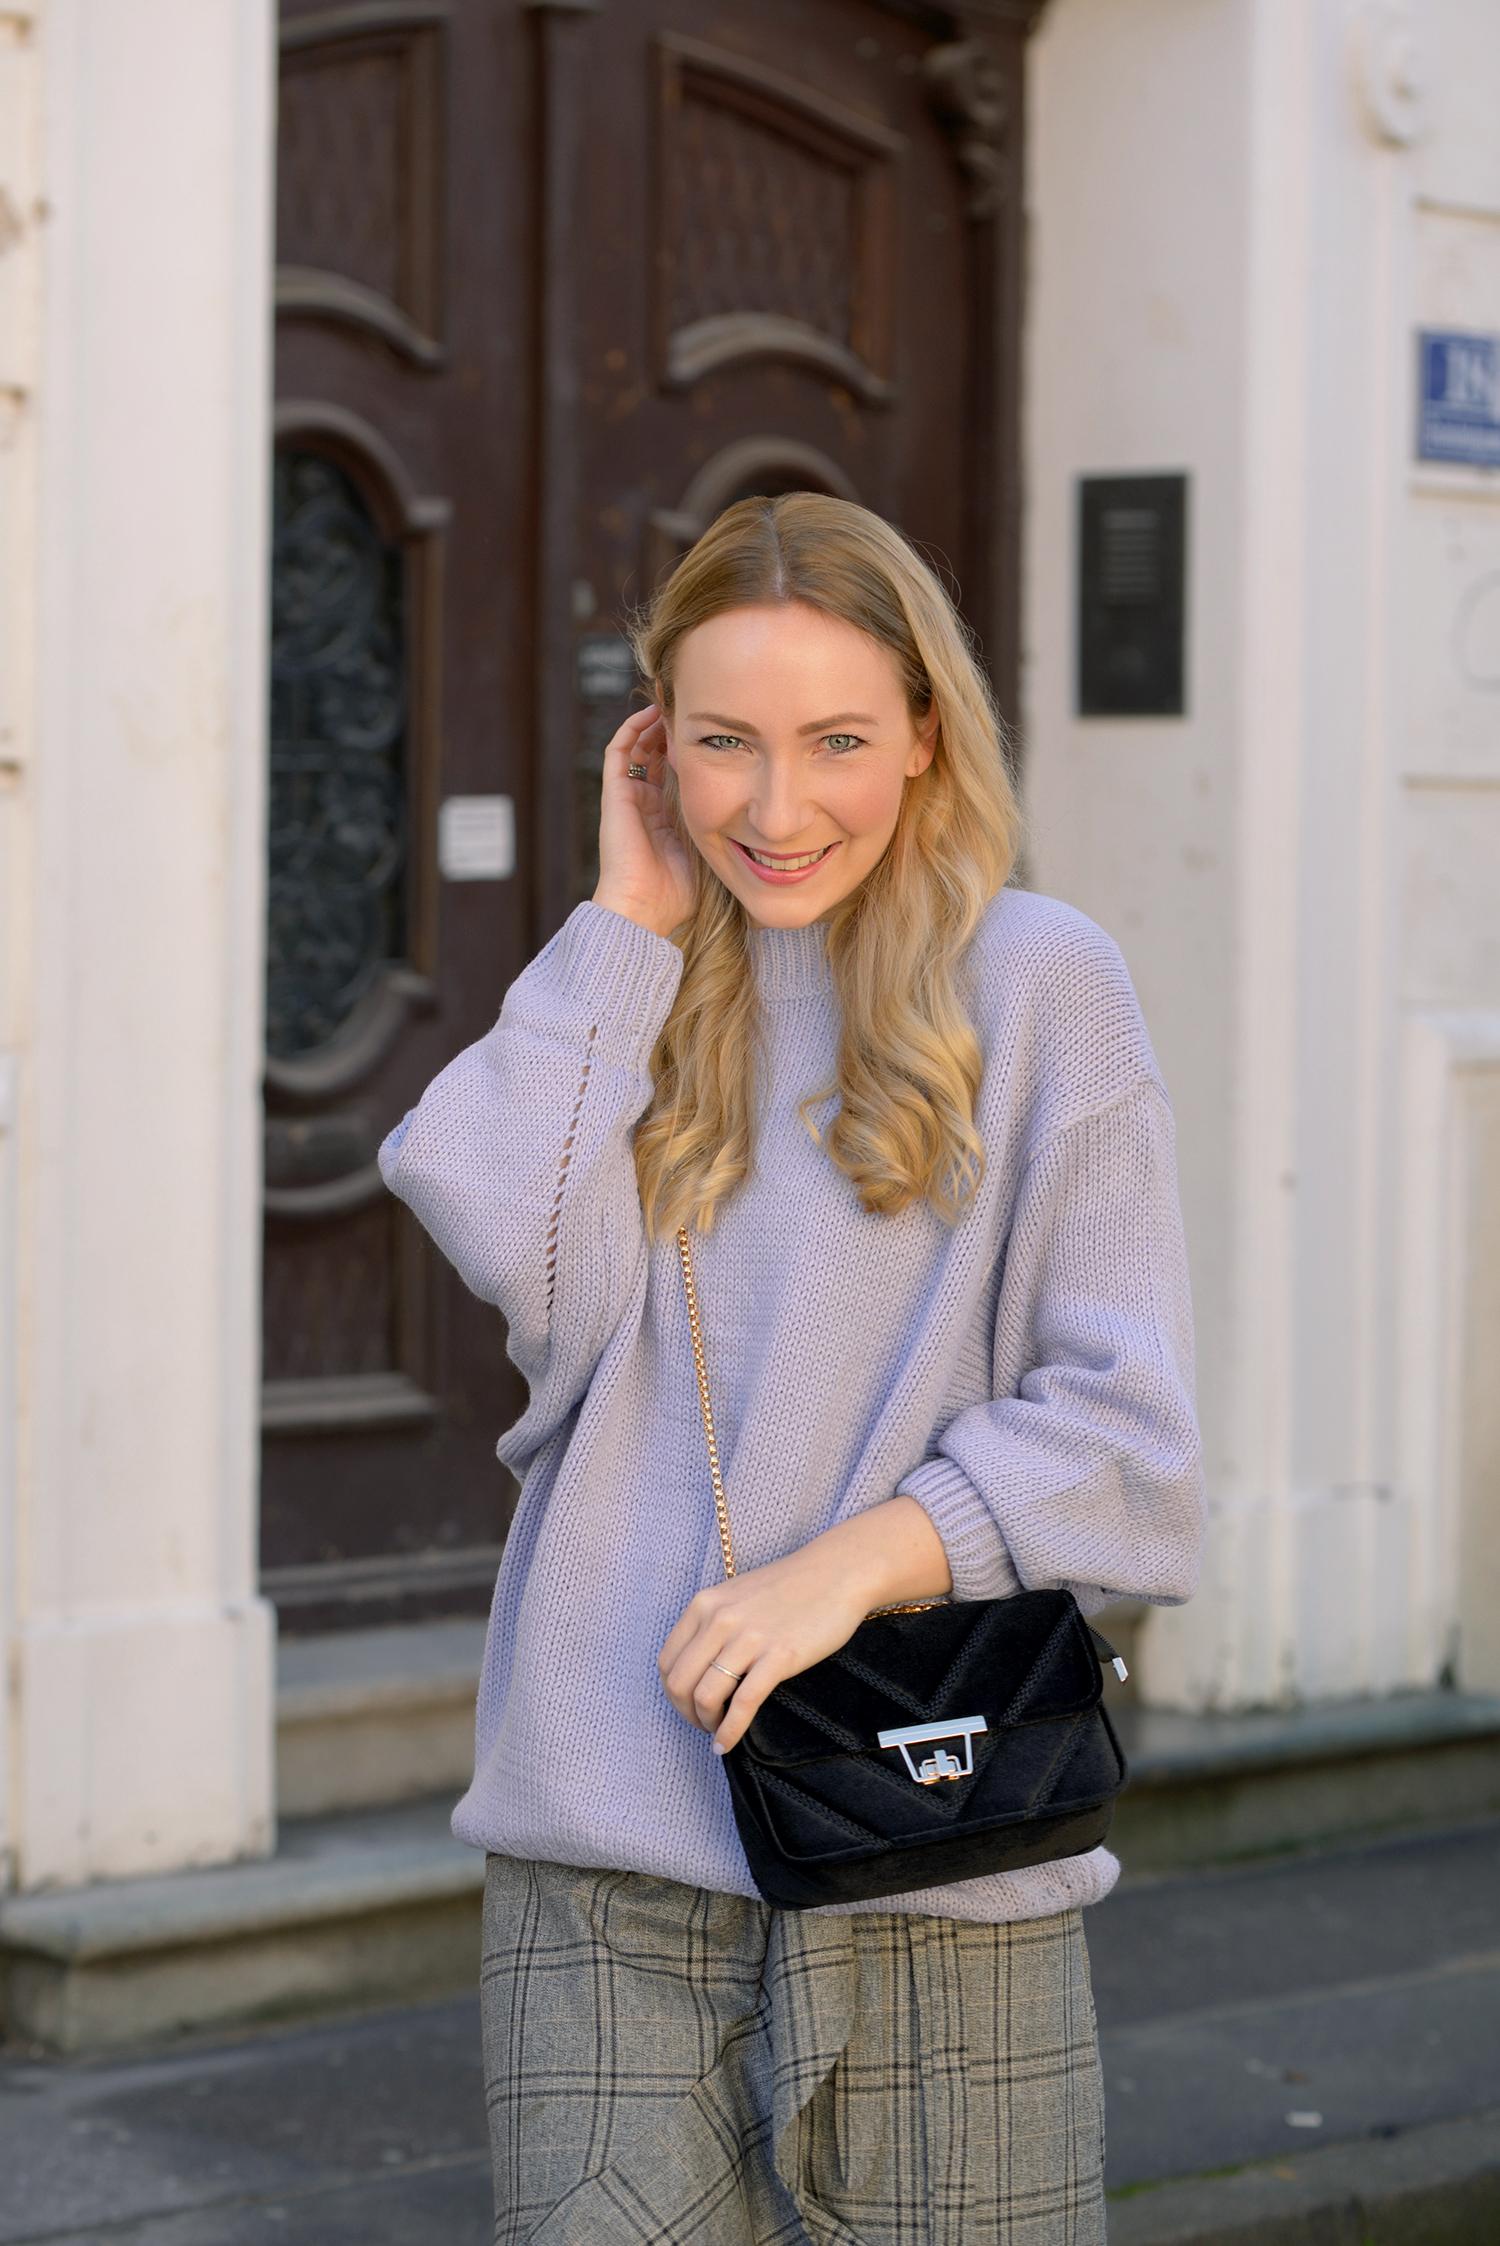 Lavender as knitwear for winter